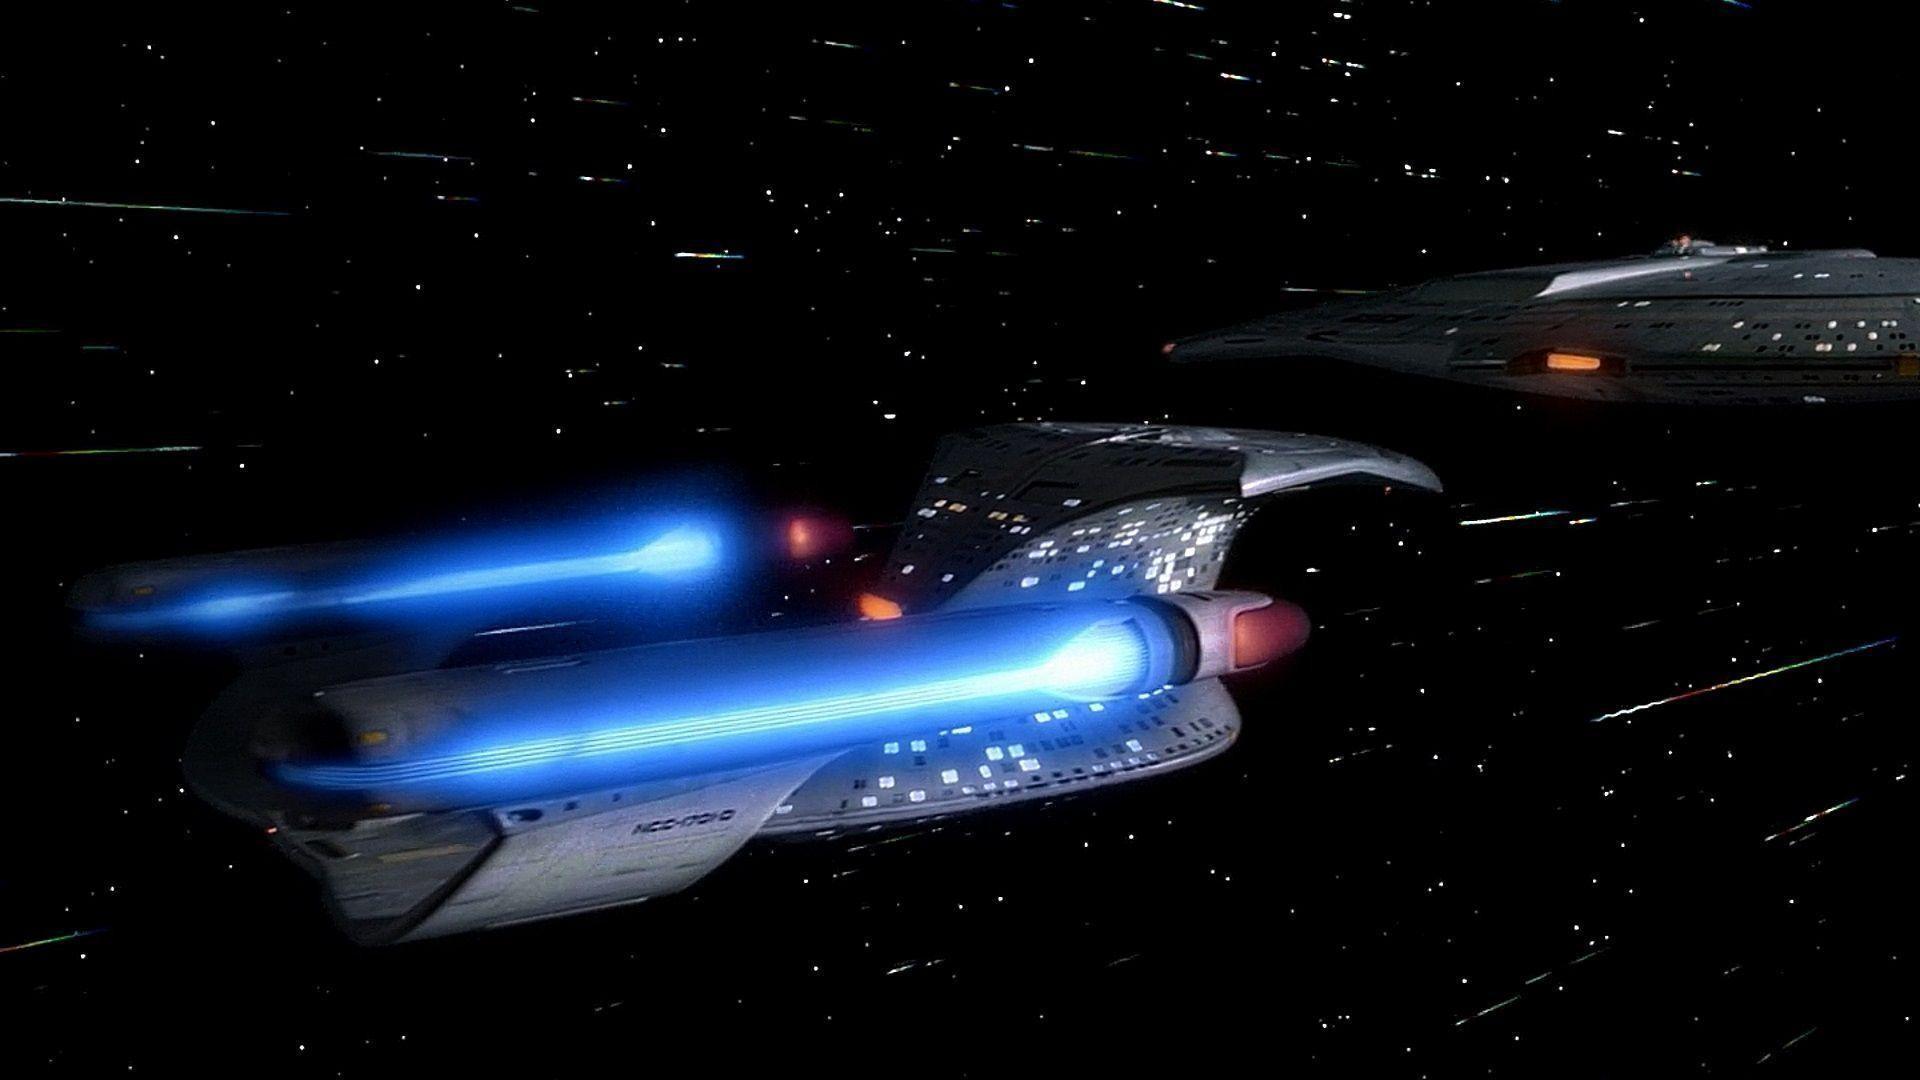 33 Star Trek: The Next Generation Wallpapers | Star Trek: The Next .